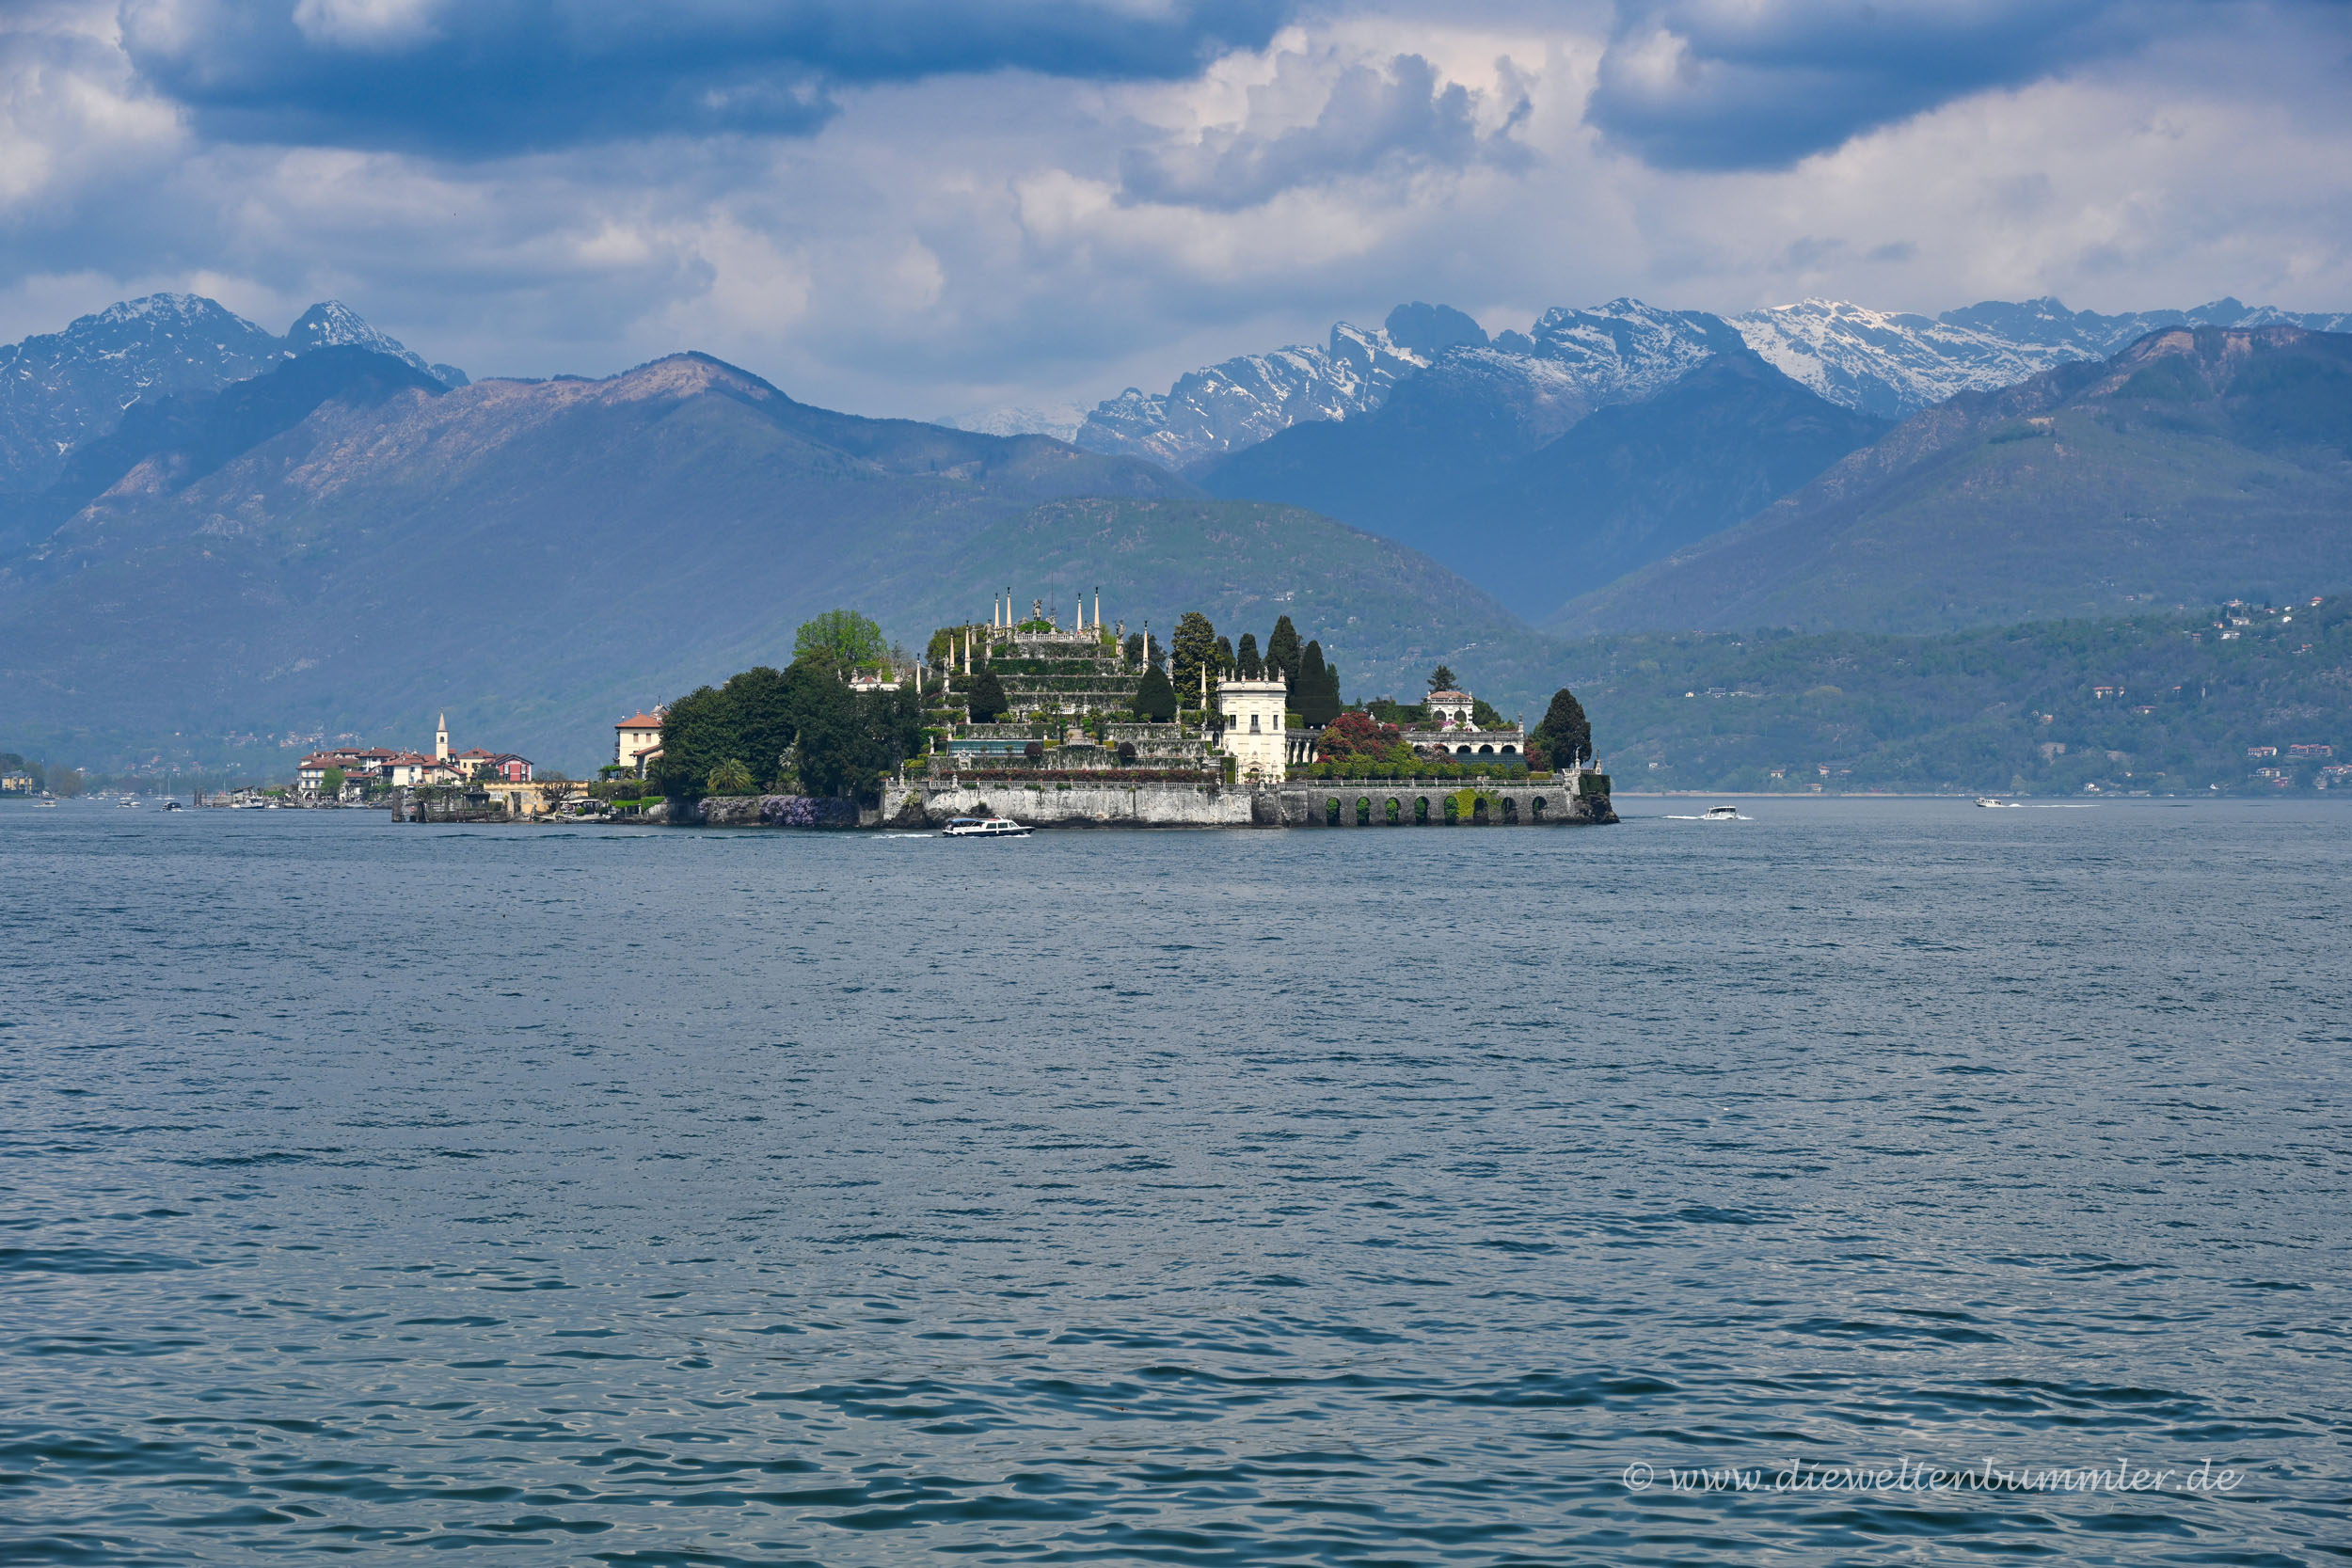 Isola Bella vor der Alpenkulisse